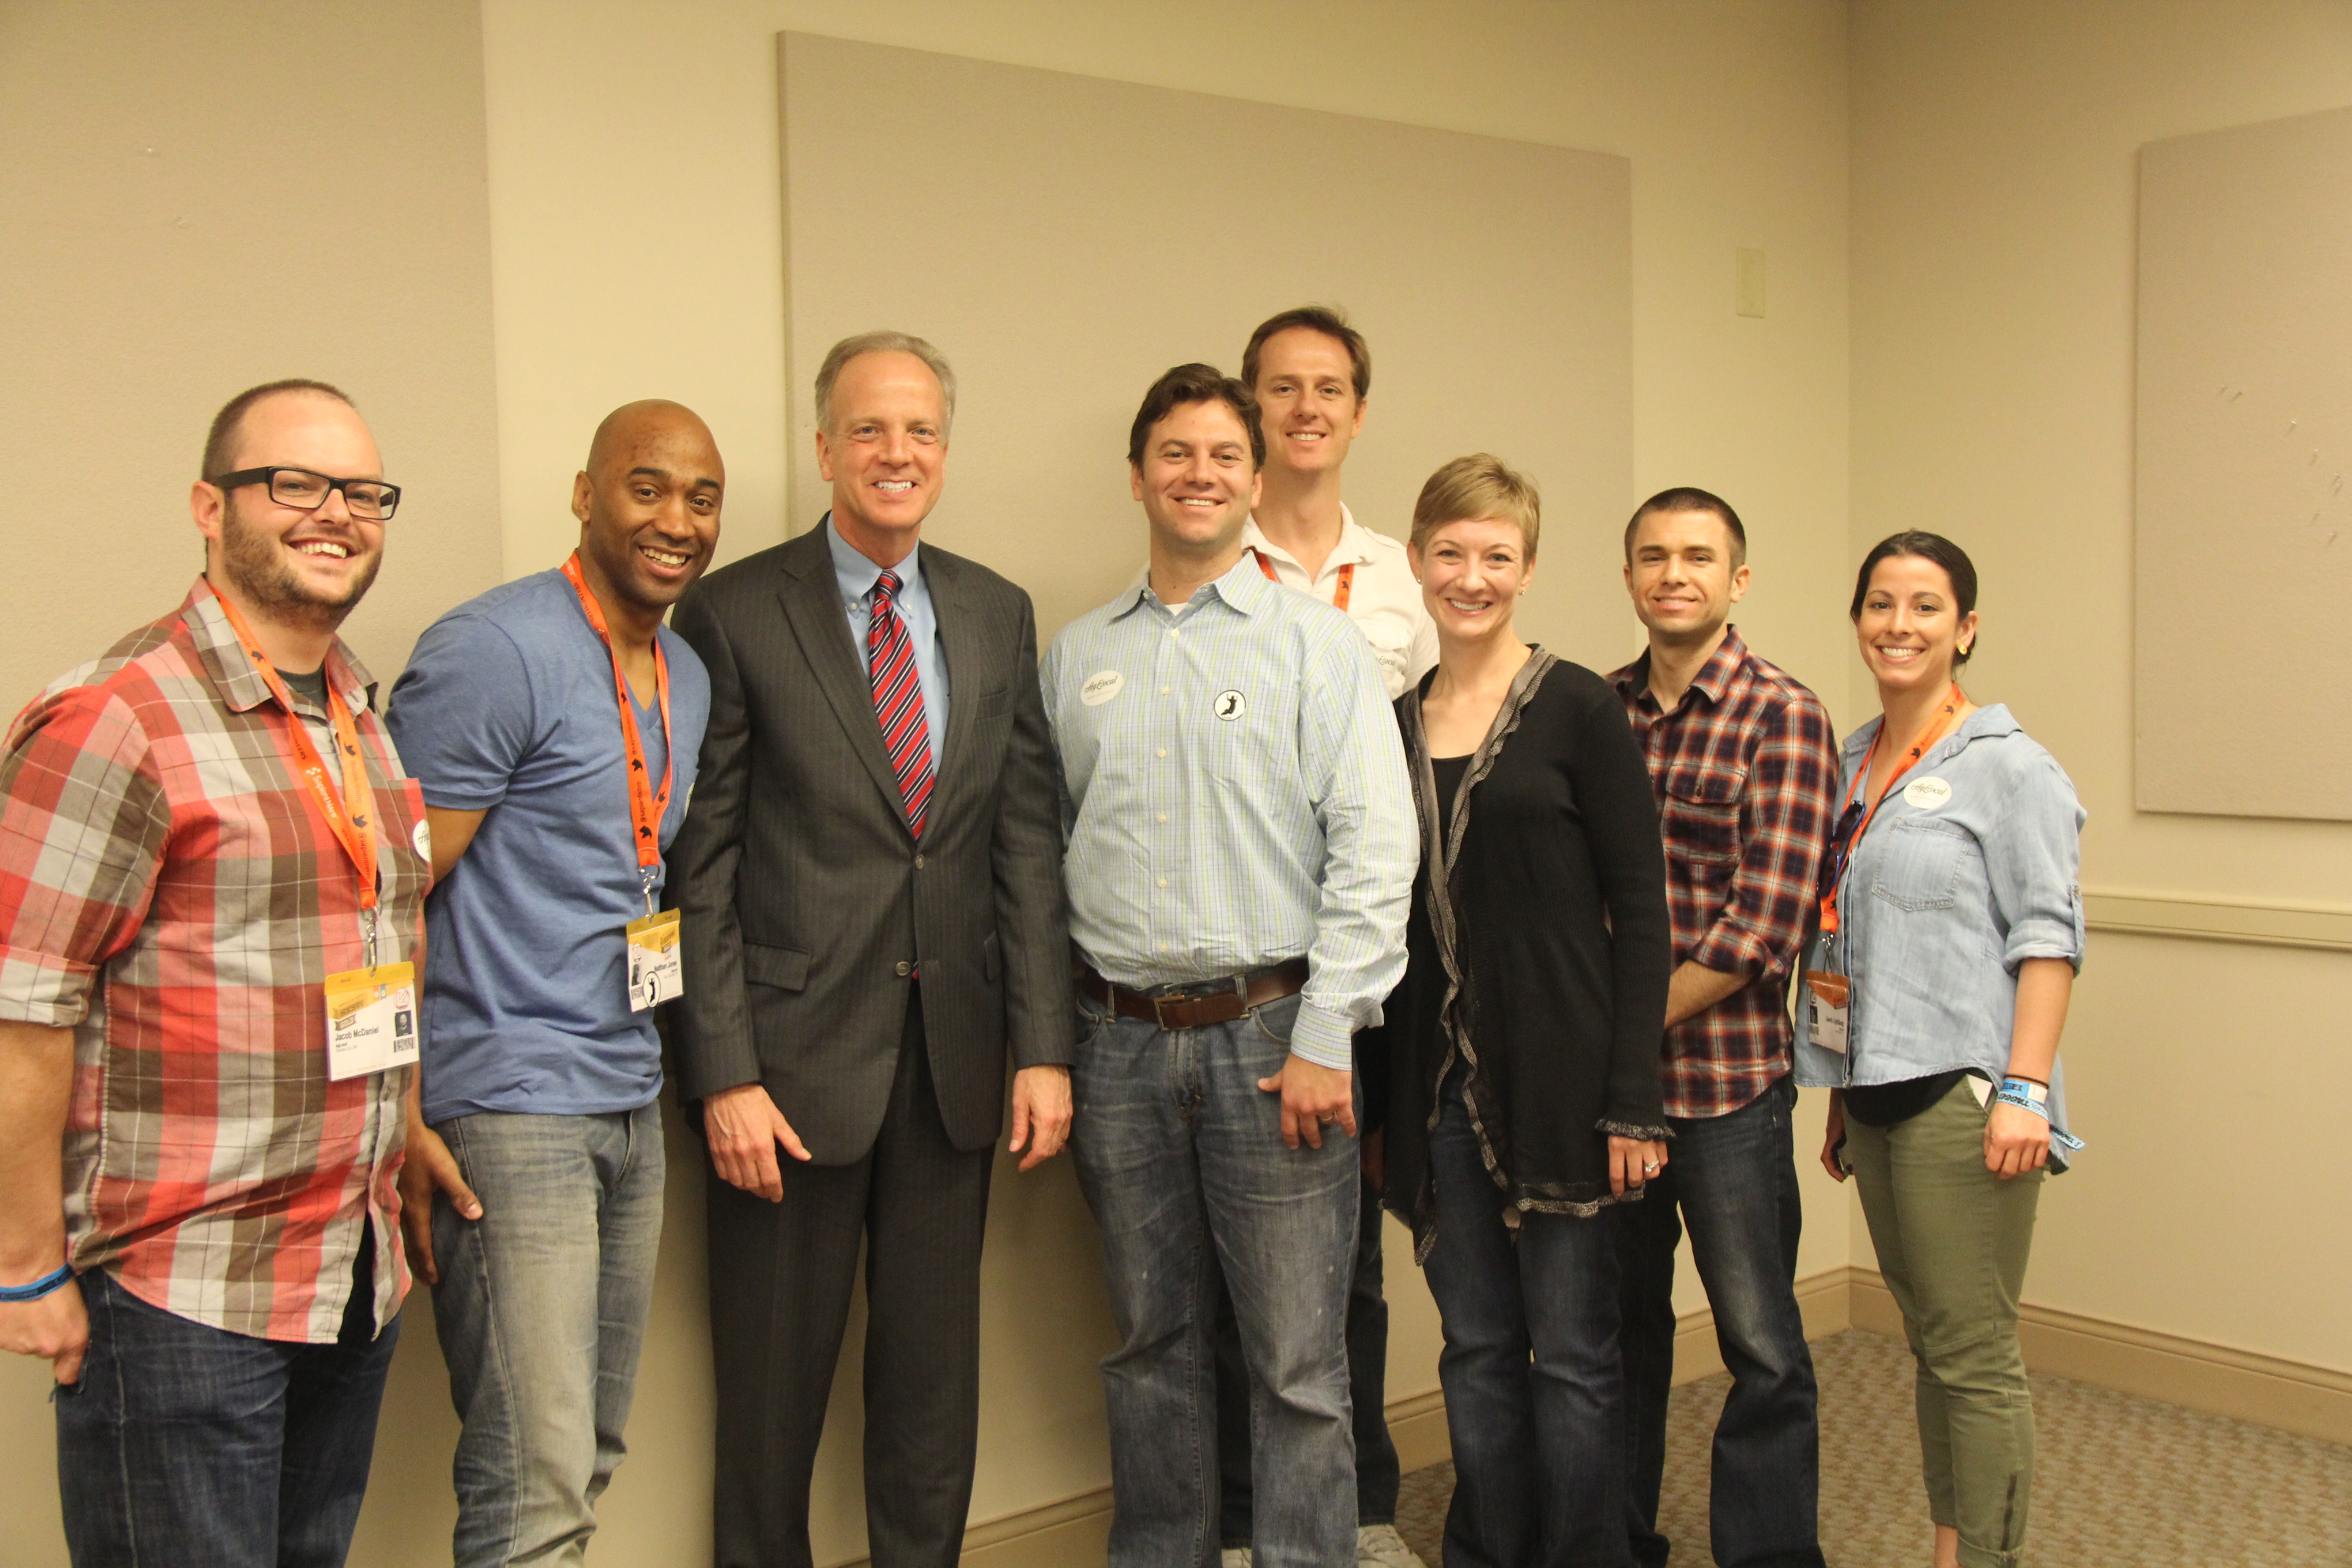 Sen. Moran Meets with KS Entrepreneurs